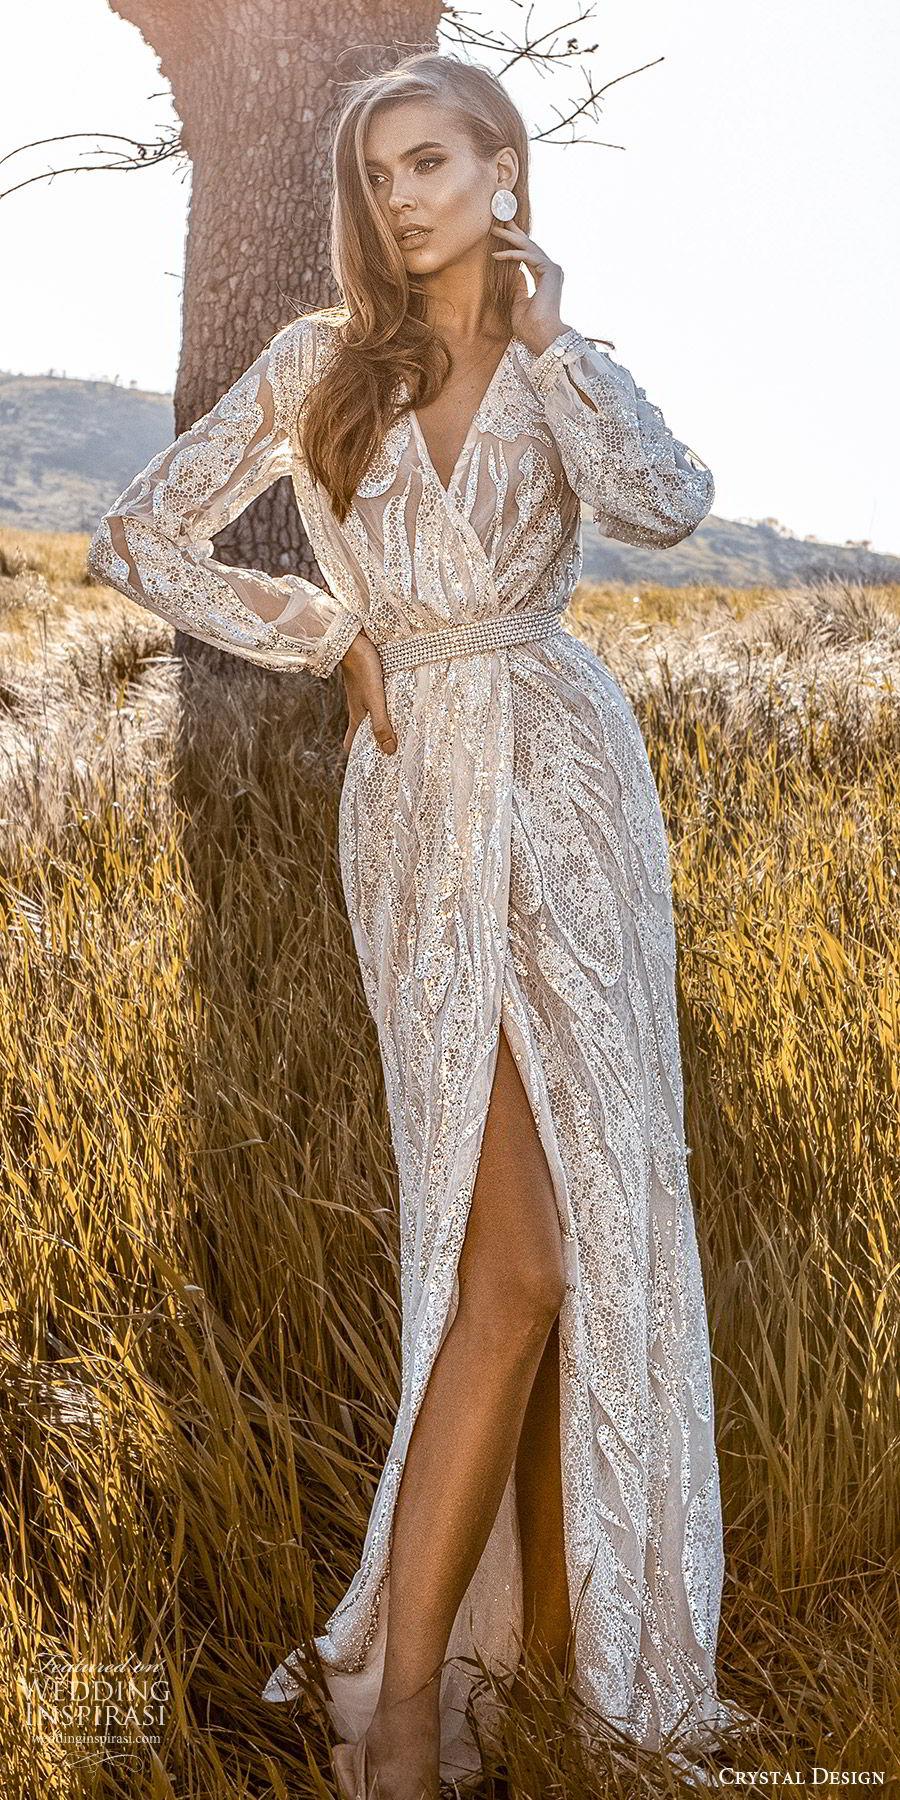 crystal design 2020 couture bridal long sleeves surplice v neckline fully embellished sheath wedding dress (3) glam elegant slit skirt sweep train beaded belt mv